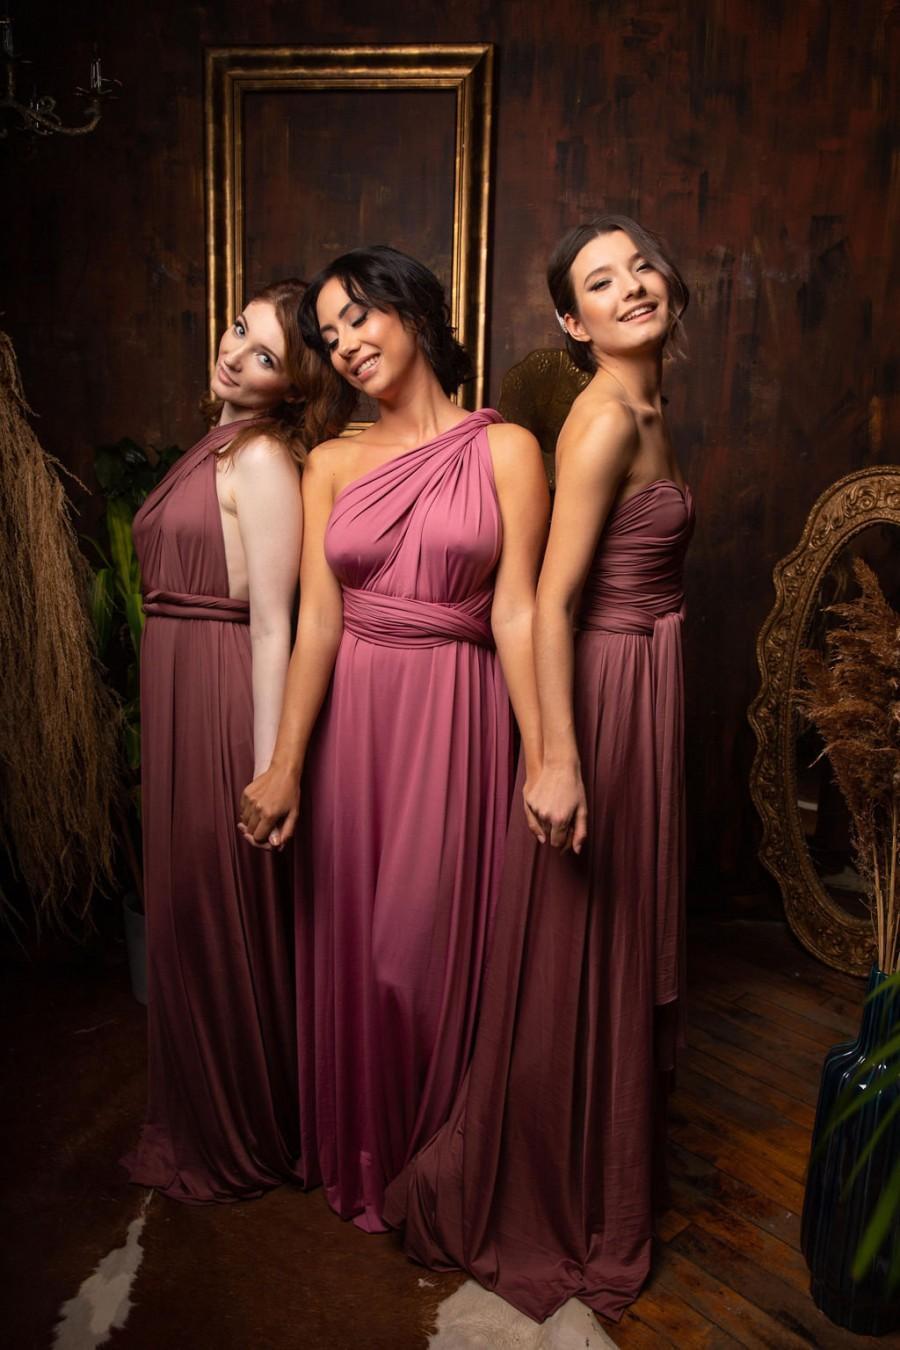 Hochzeit - Infinity Bridesmaid Party Dress With Free Bandeau, Convertible Dress, Bridesmaid Dress, Long  Dress Plus Size, Multi-way Dress,  Wrap Dress